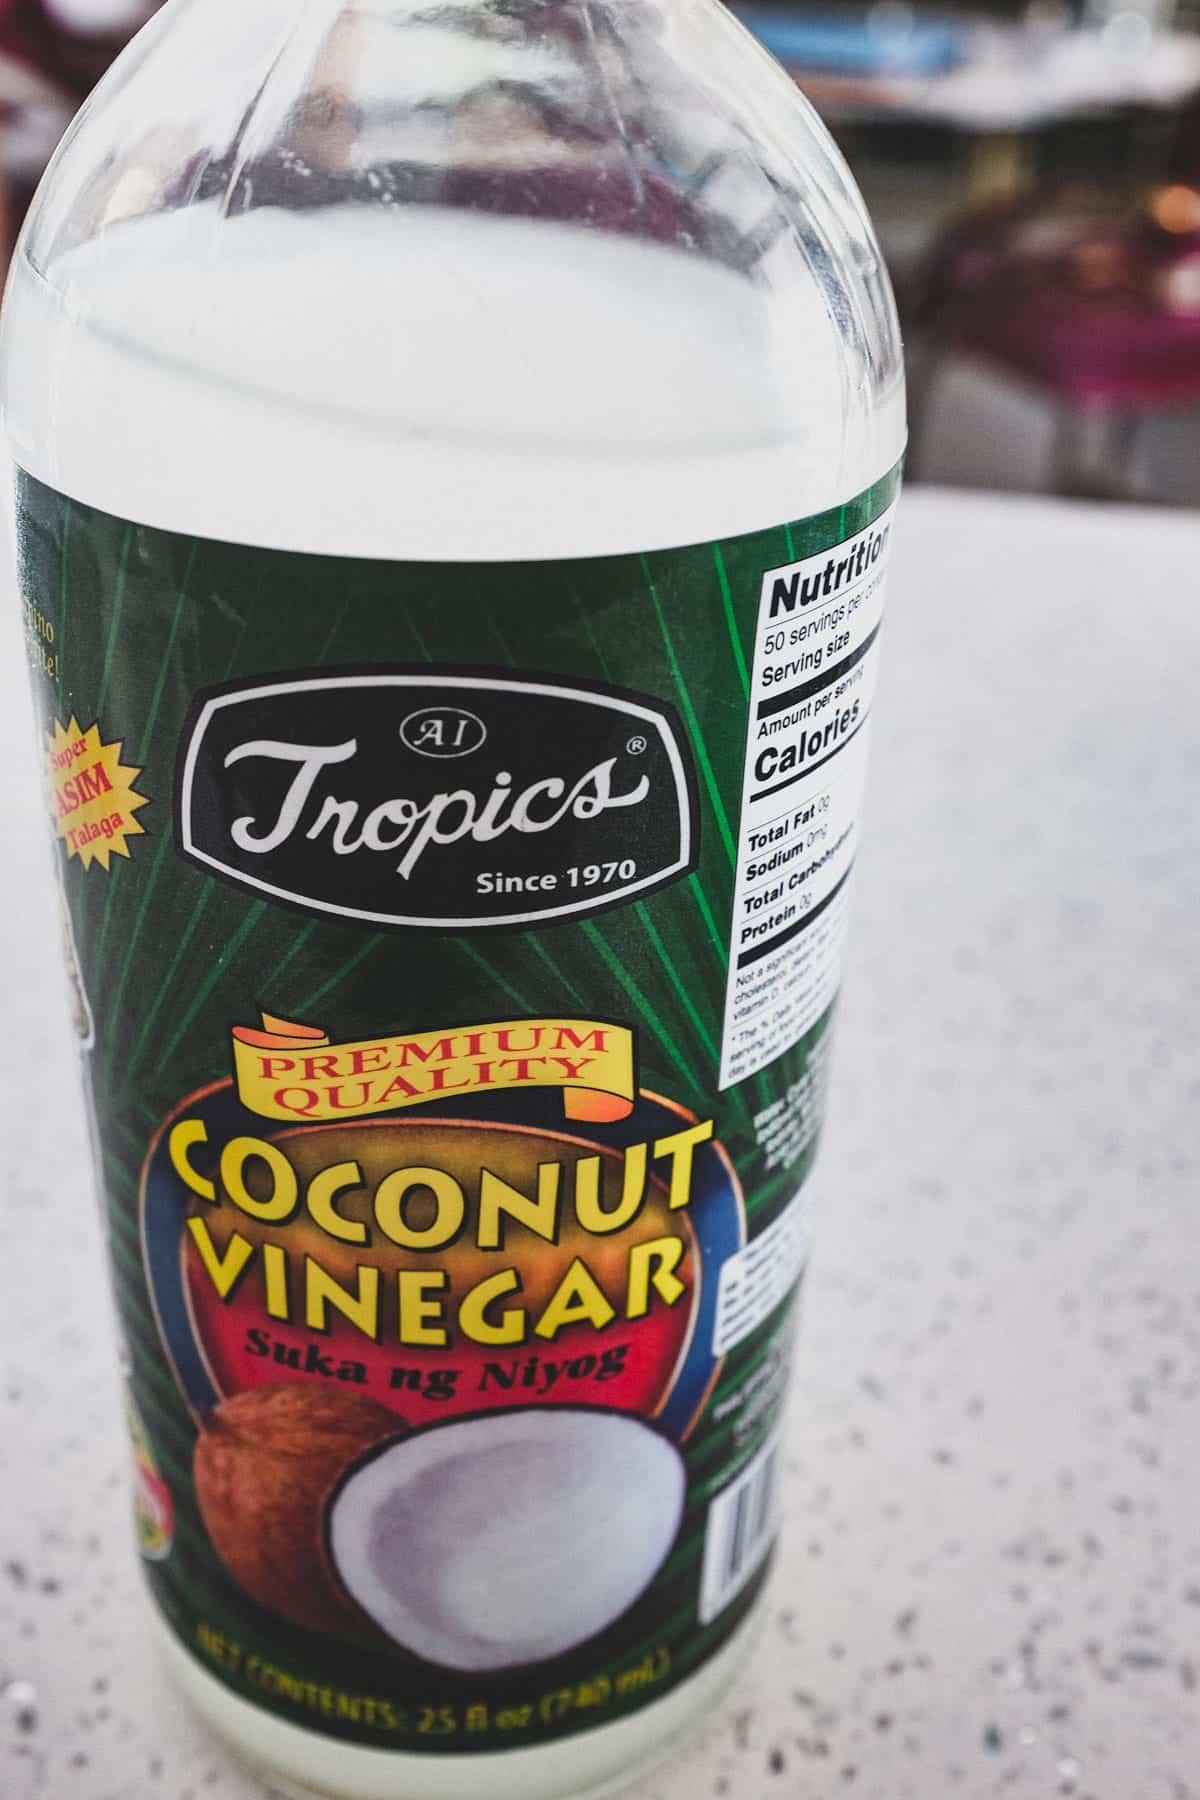 A bottle of coconut vinegar